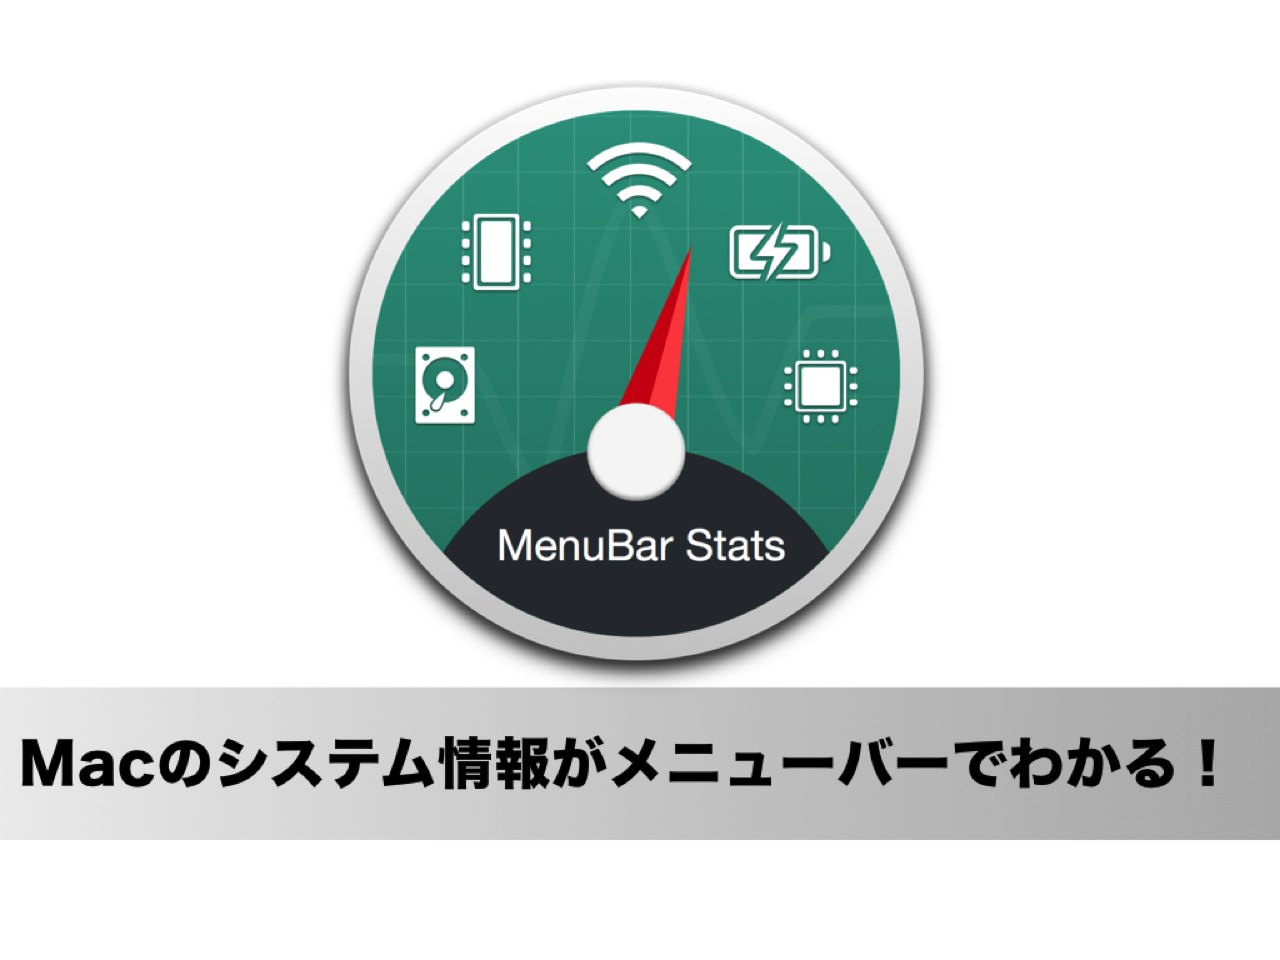 Macのシステム情報がメニューバーでひと目でわかる「Menubar Stats 2」が「OS X El Capitan」に正式対応